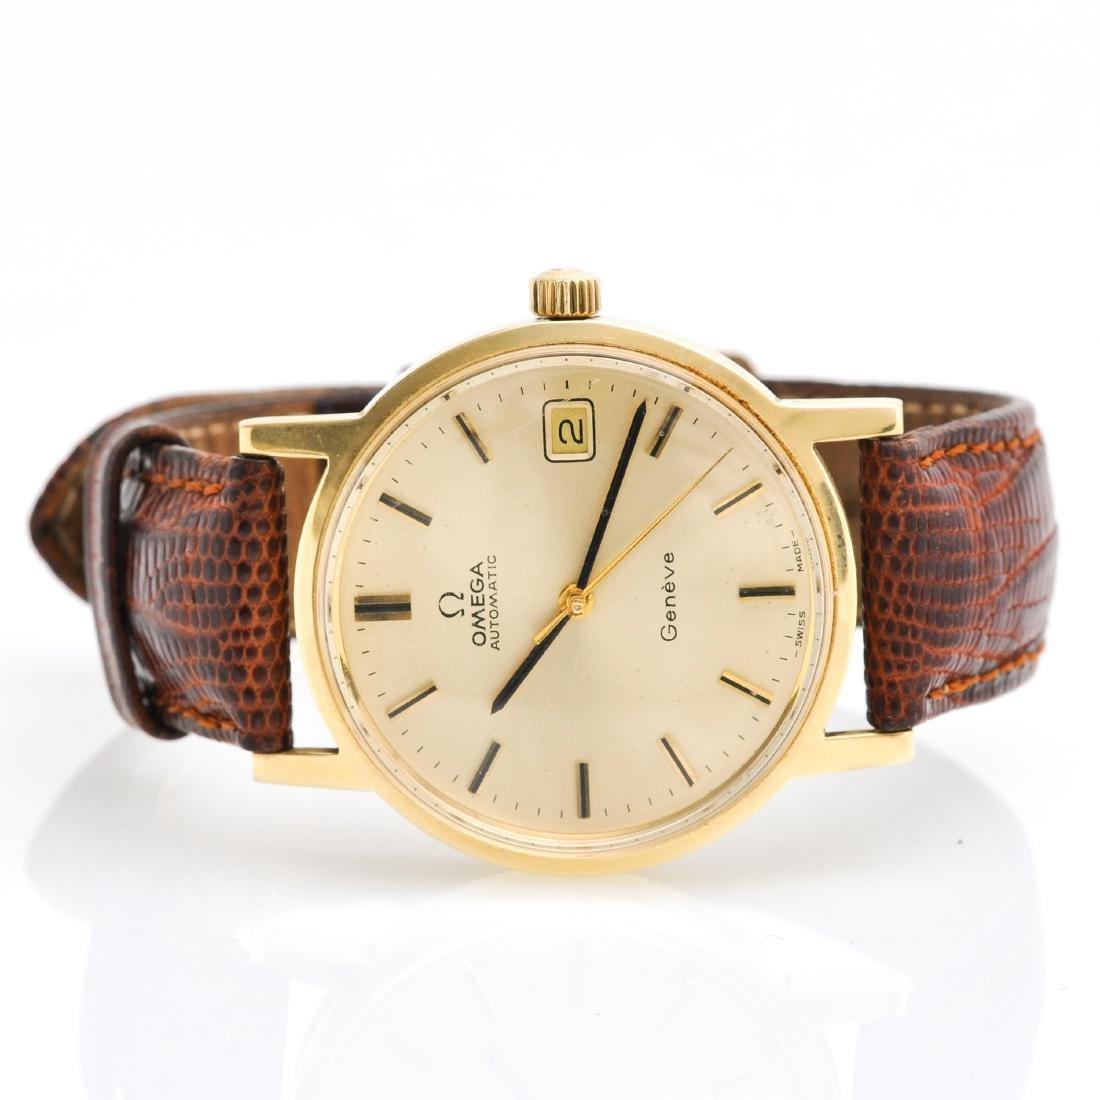 A Mens 14KG Omega Watch